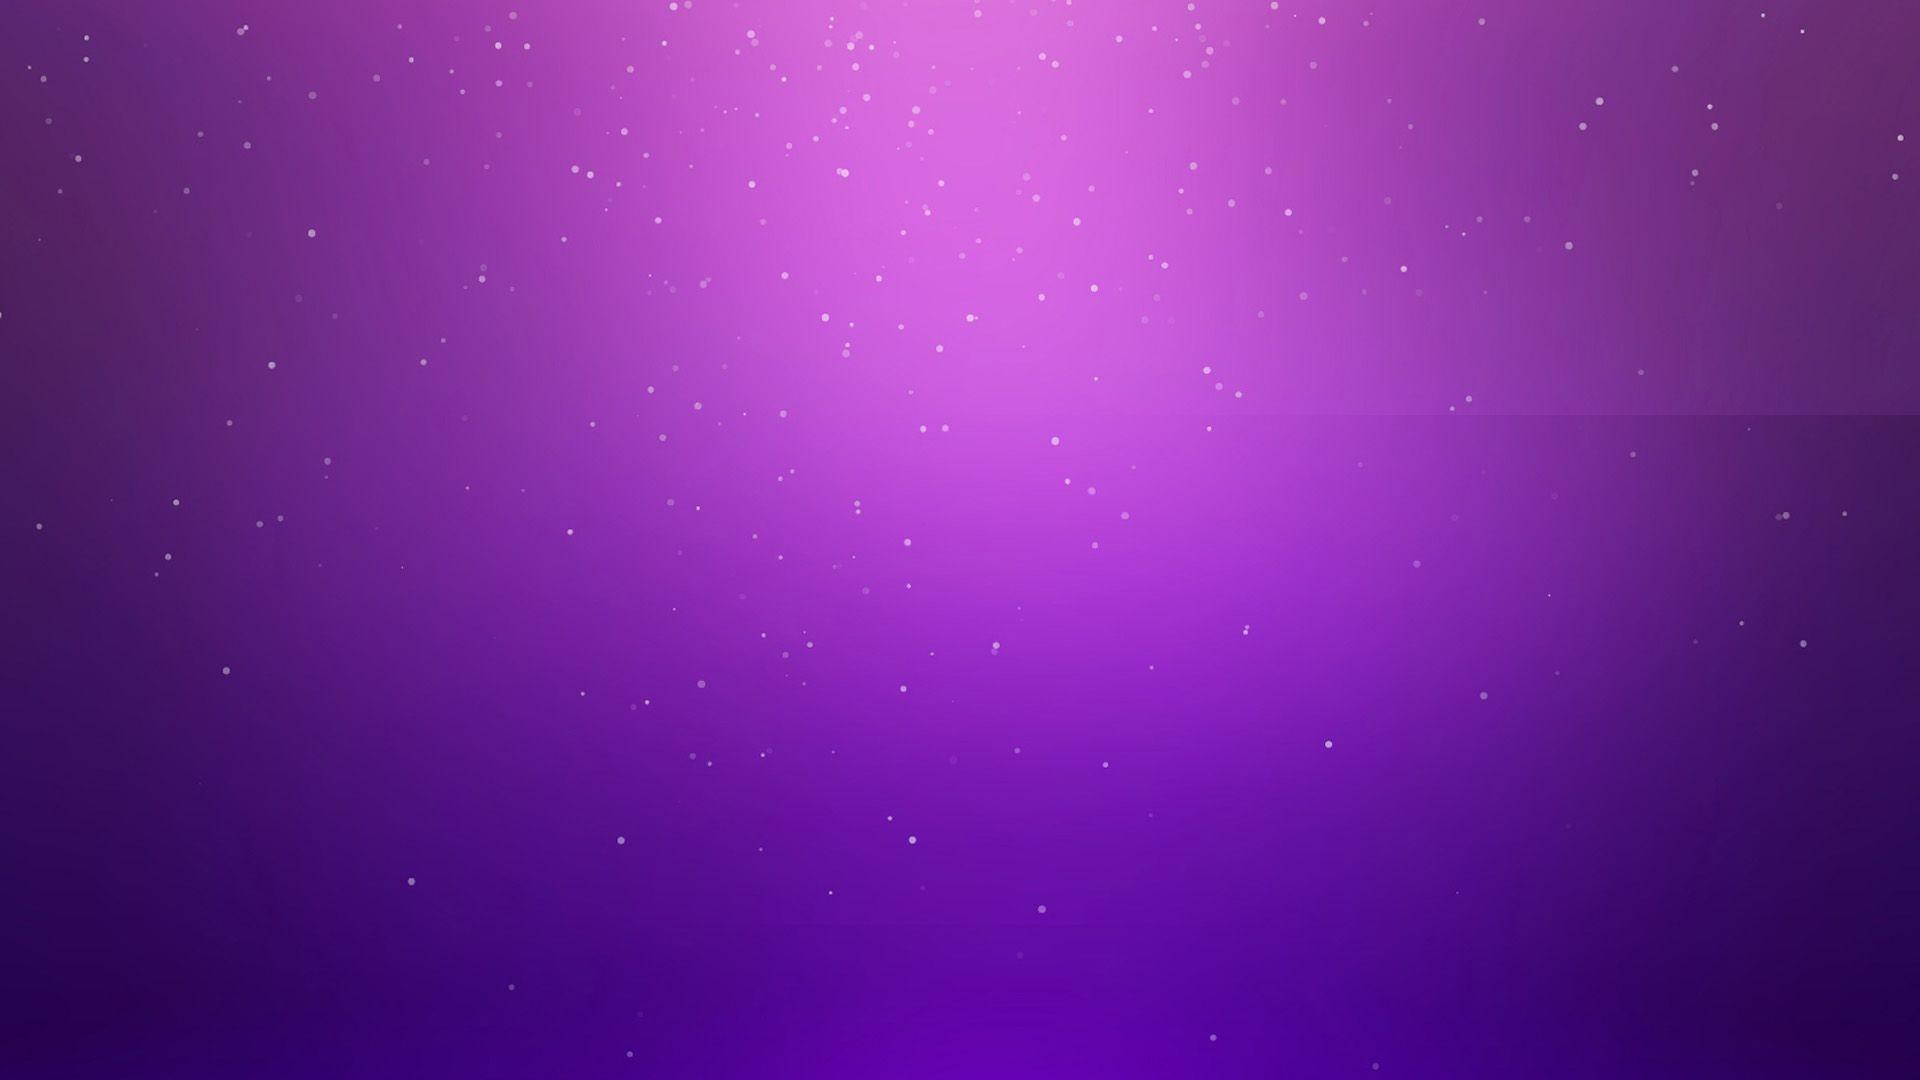 light purple wallpaper images